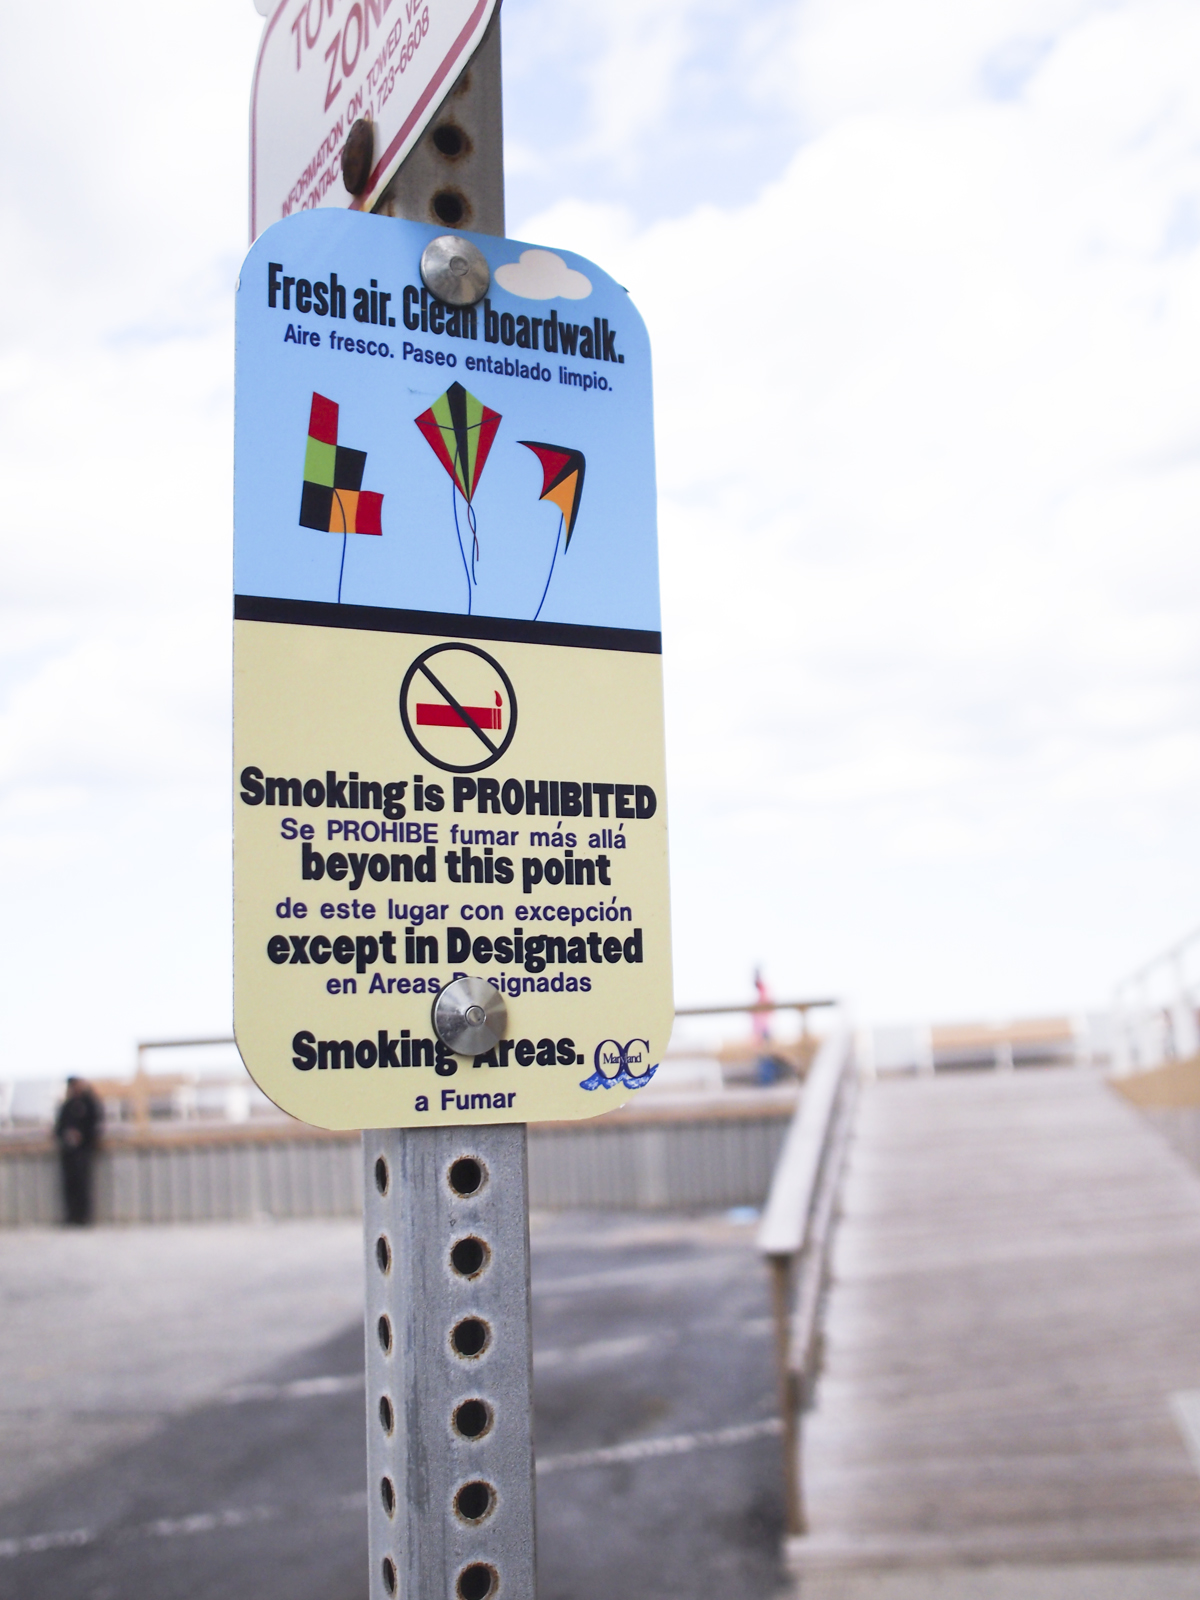 Boardwalk smoking stops today